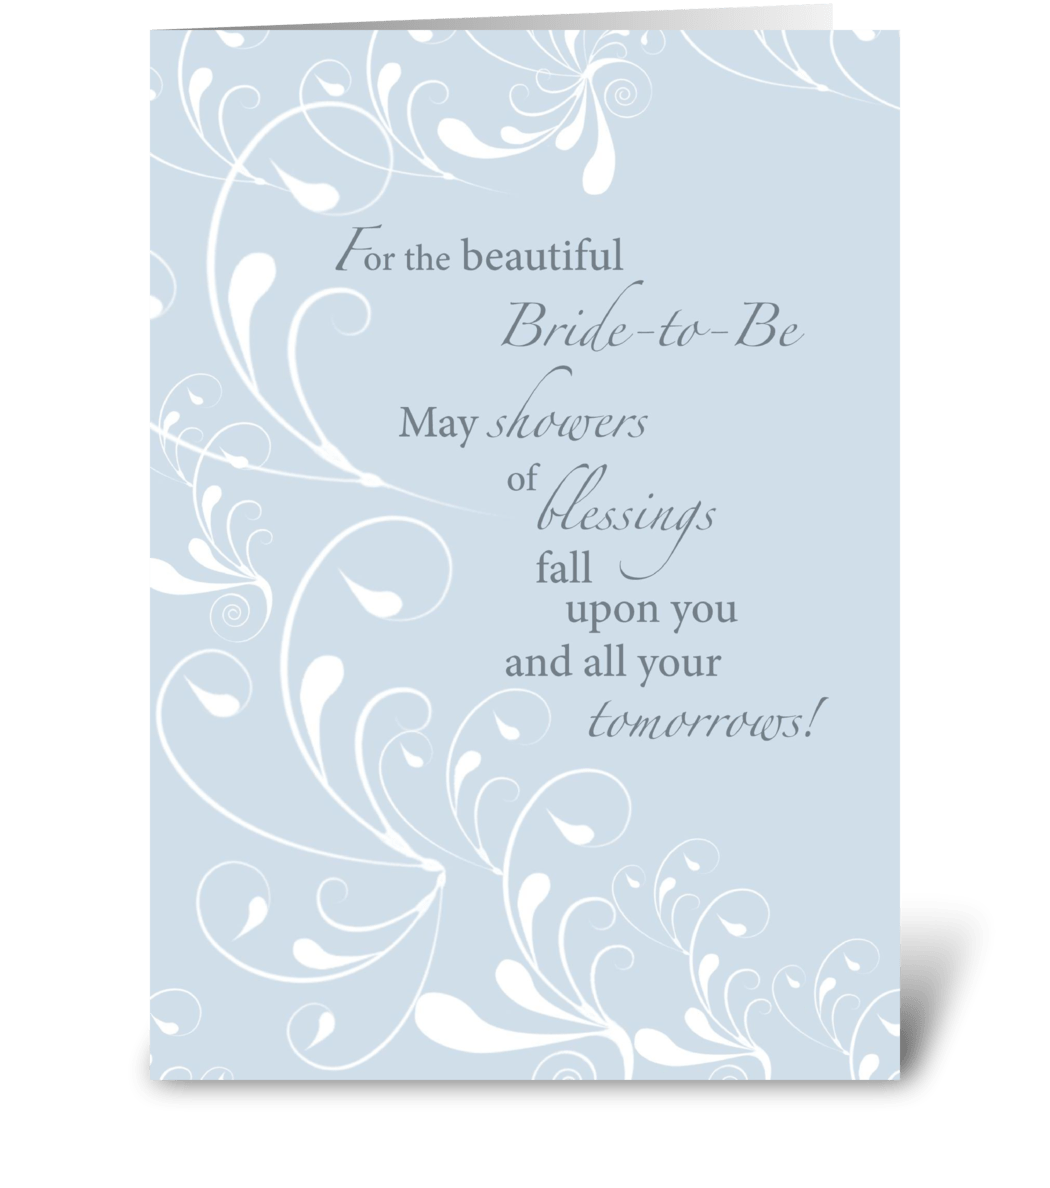 bridal shower congratulations swirls  send this greeting